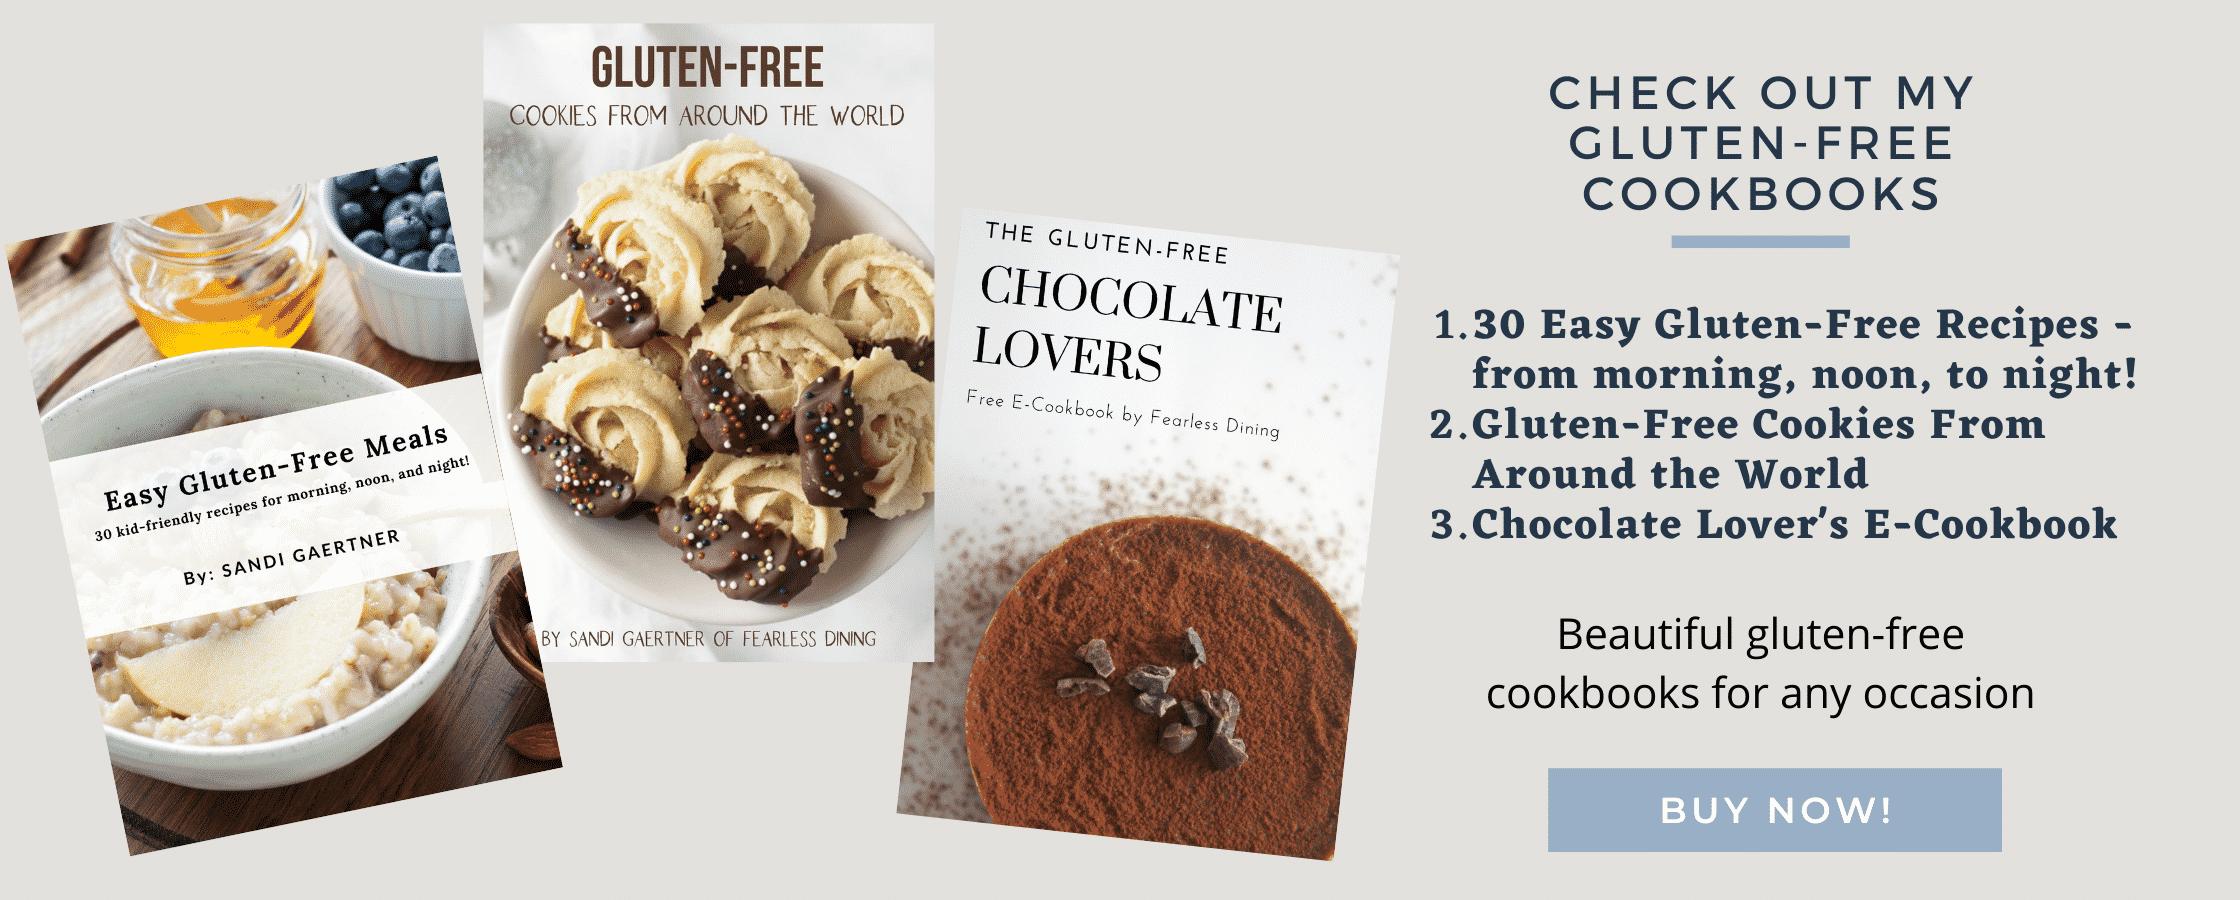 cookbook banner ad